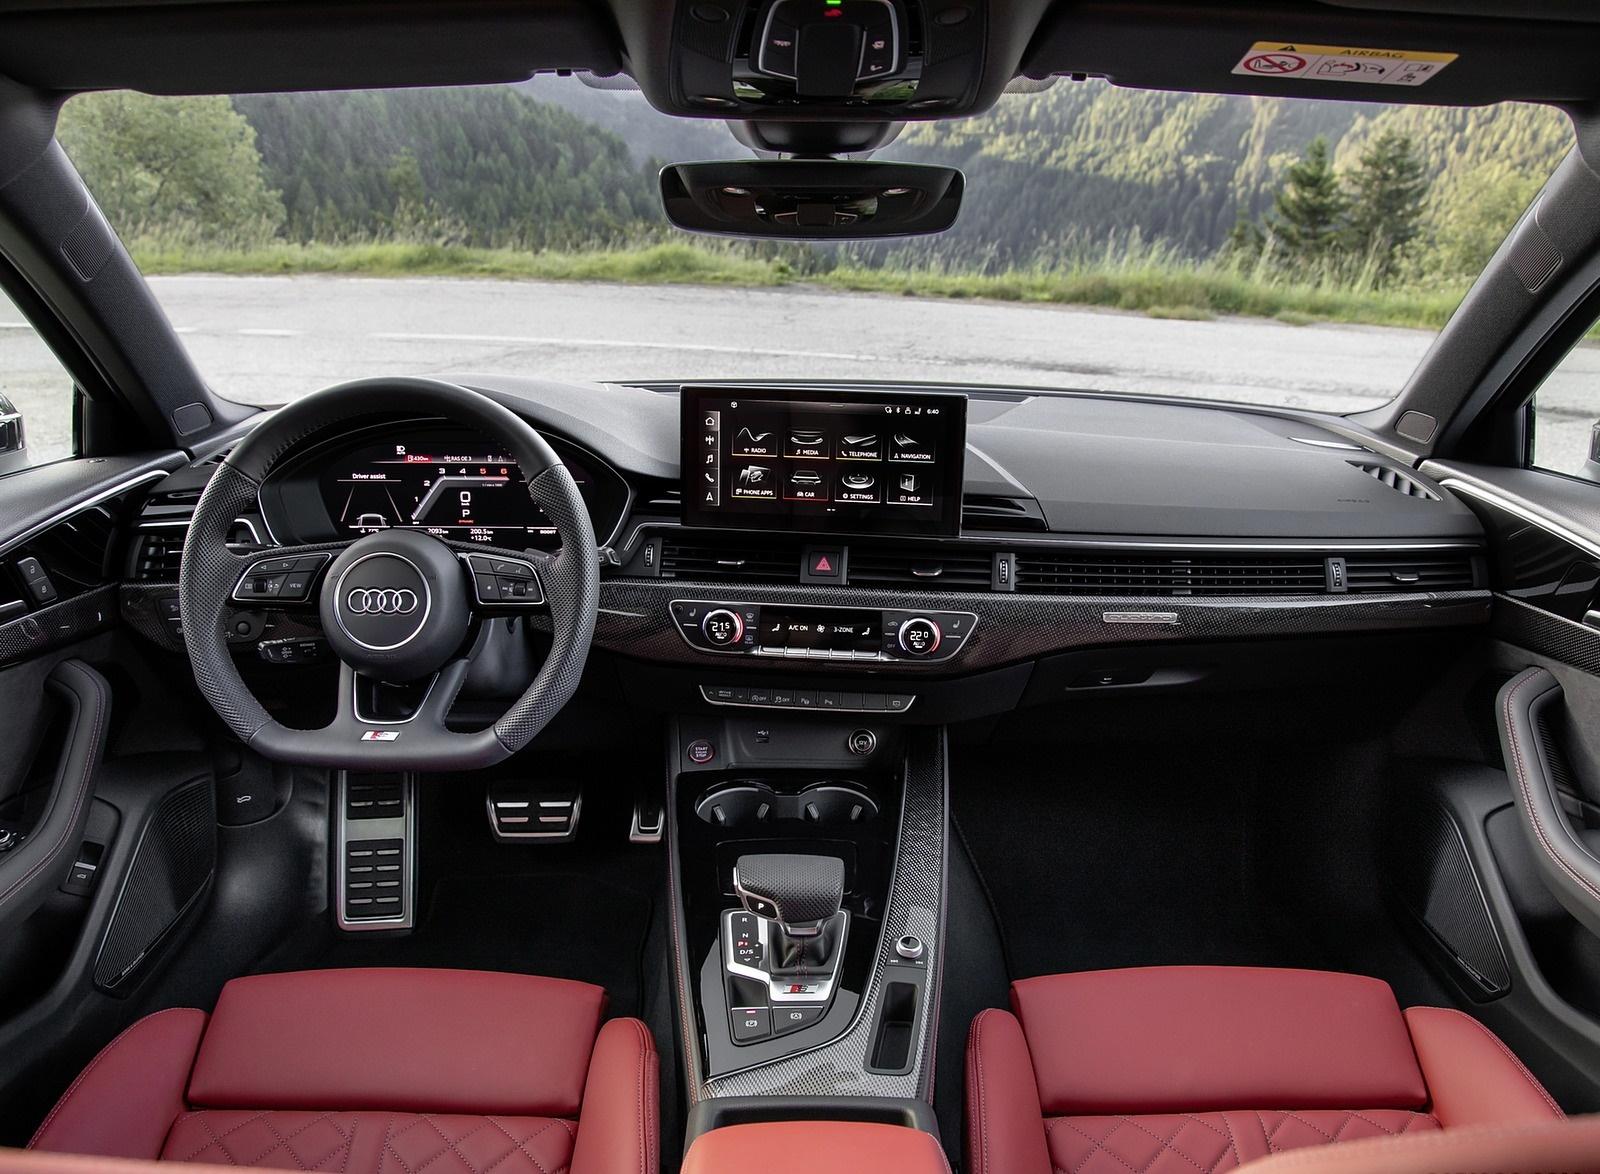 Kelebihan Audi S4 2019 Top Model Tahun Ini